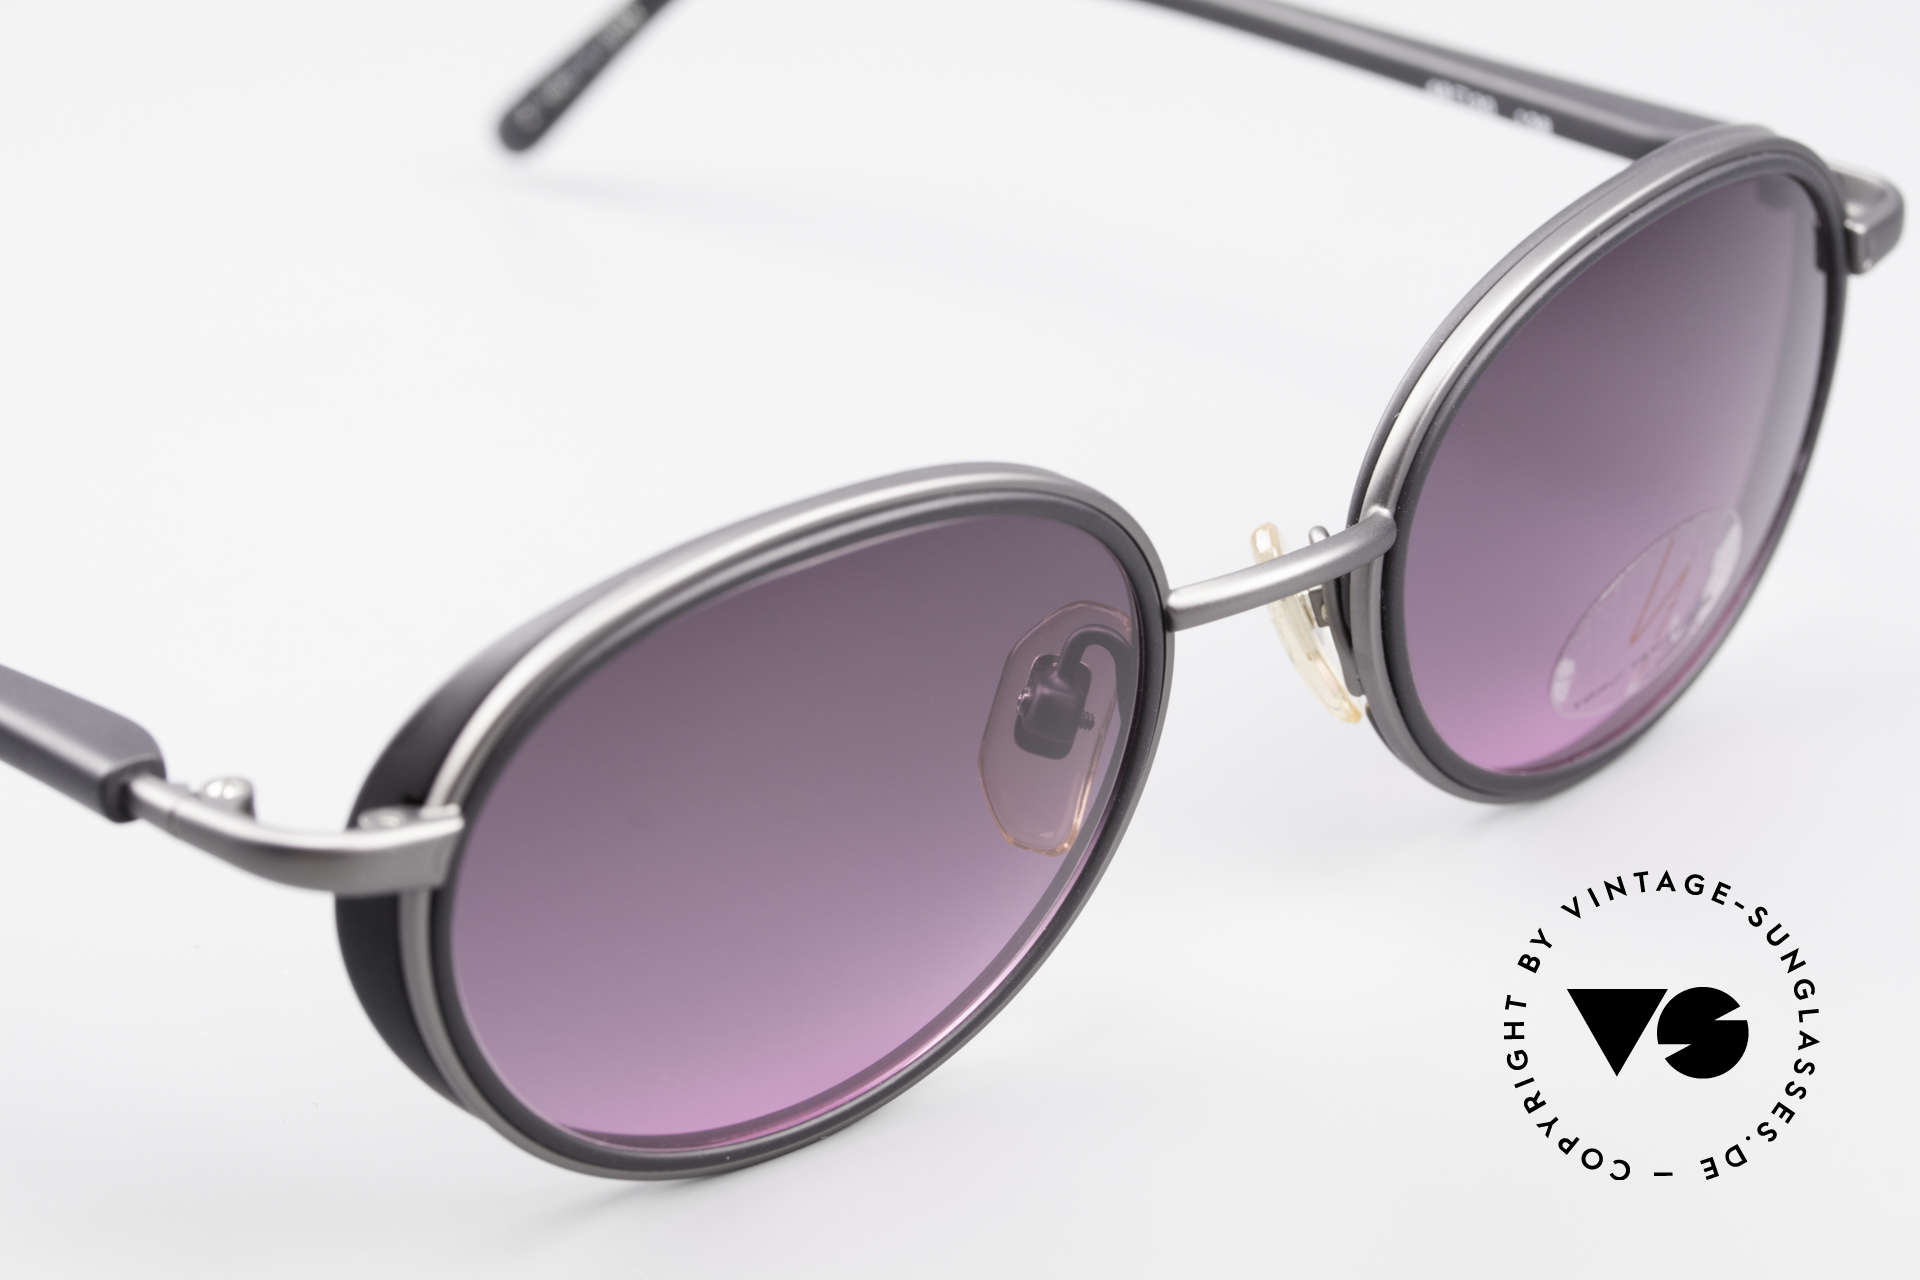 Yohji Yamamoto 51-6201 Side Shields Sunglasses 90's, unused (like all our Haute Couture designer sunglasses), Made for Women